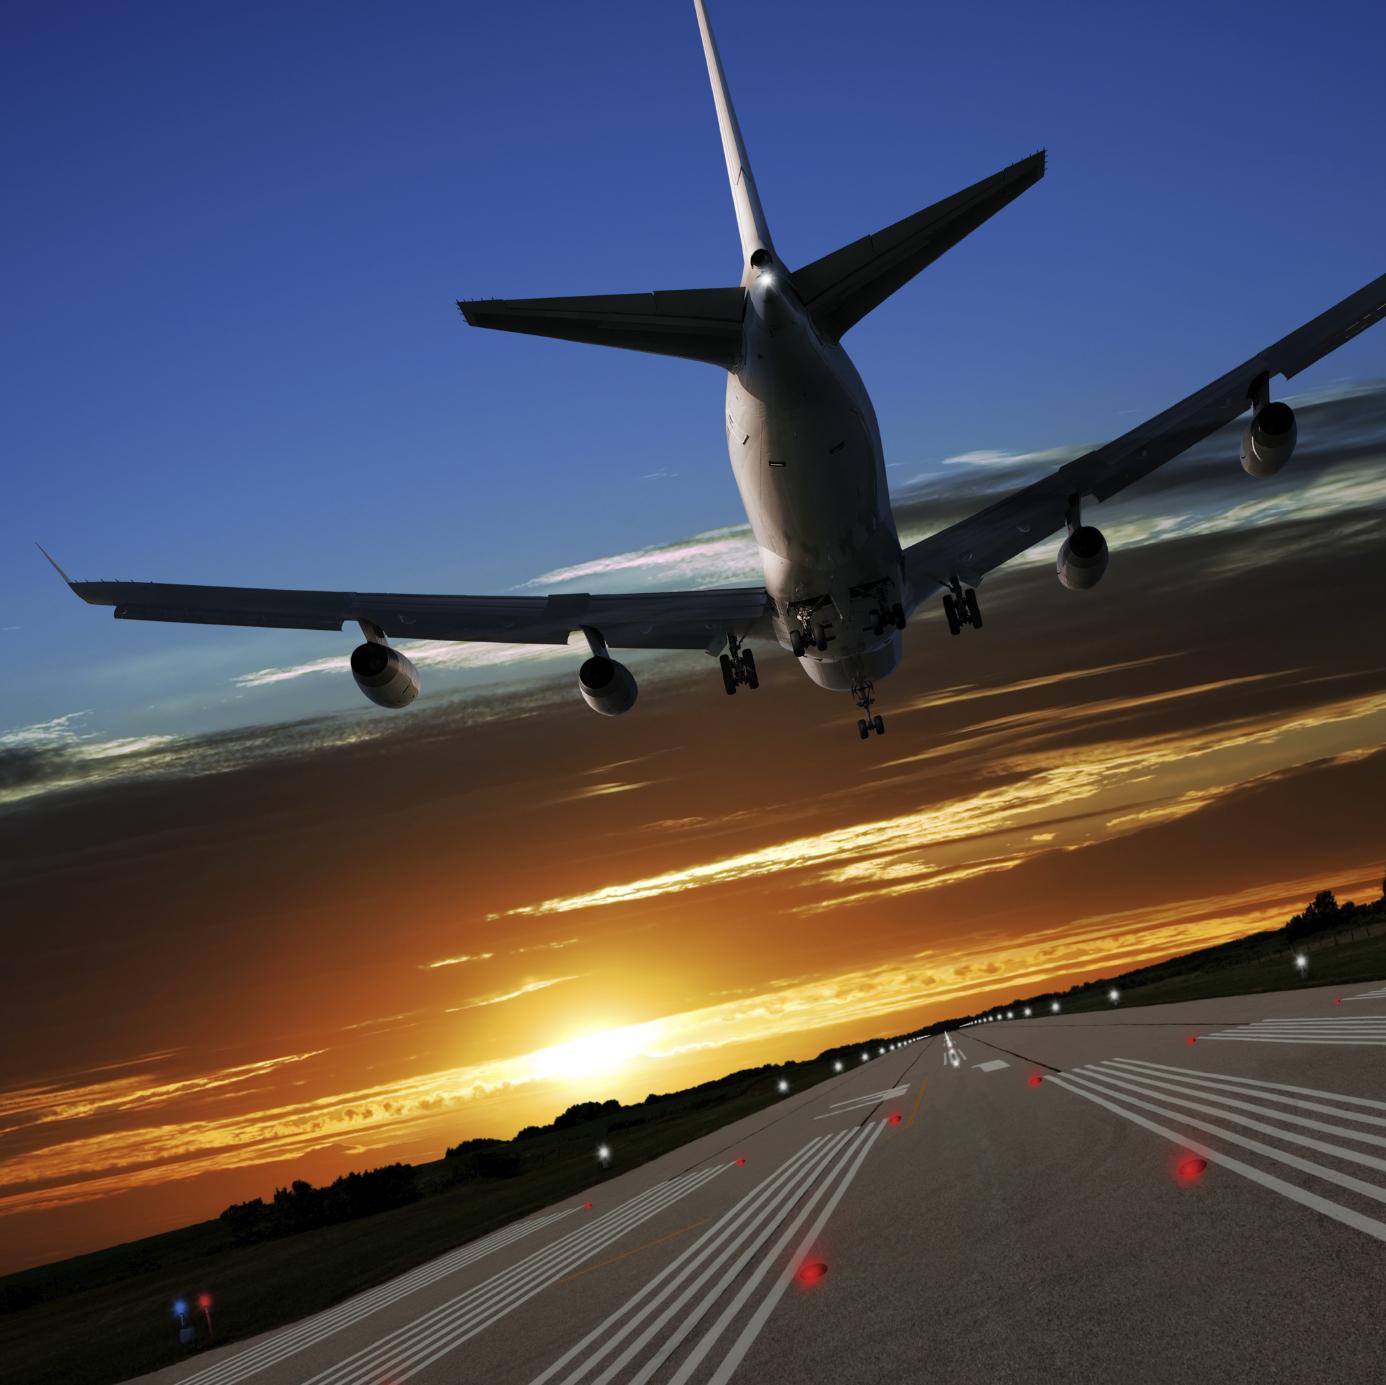 TICKET PURCHASE & FLIGHT COORDINATION